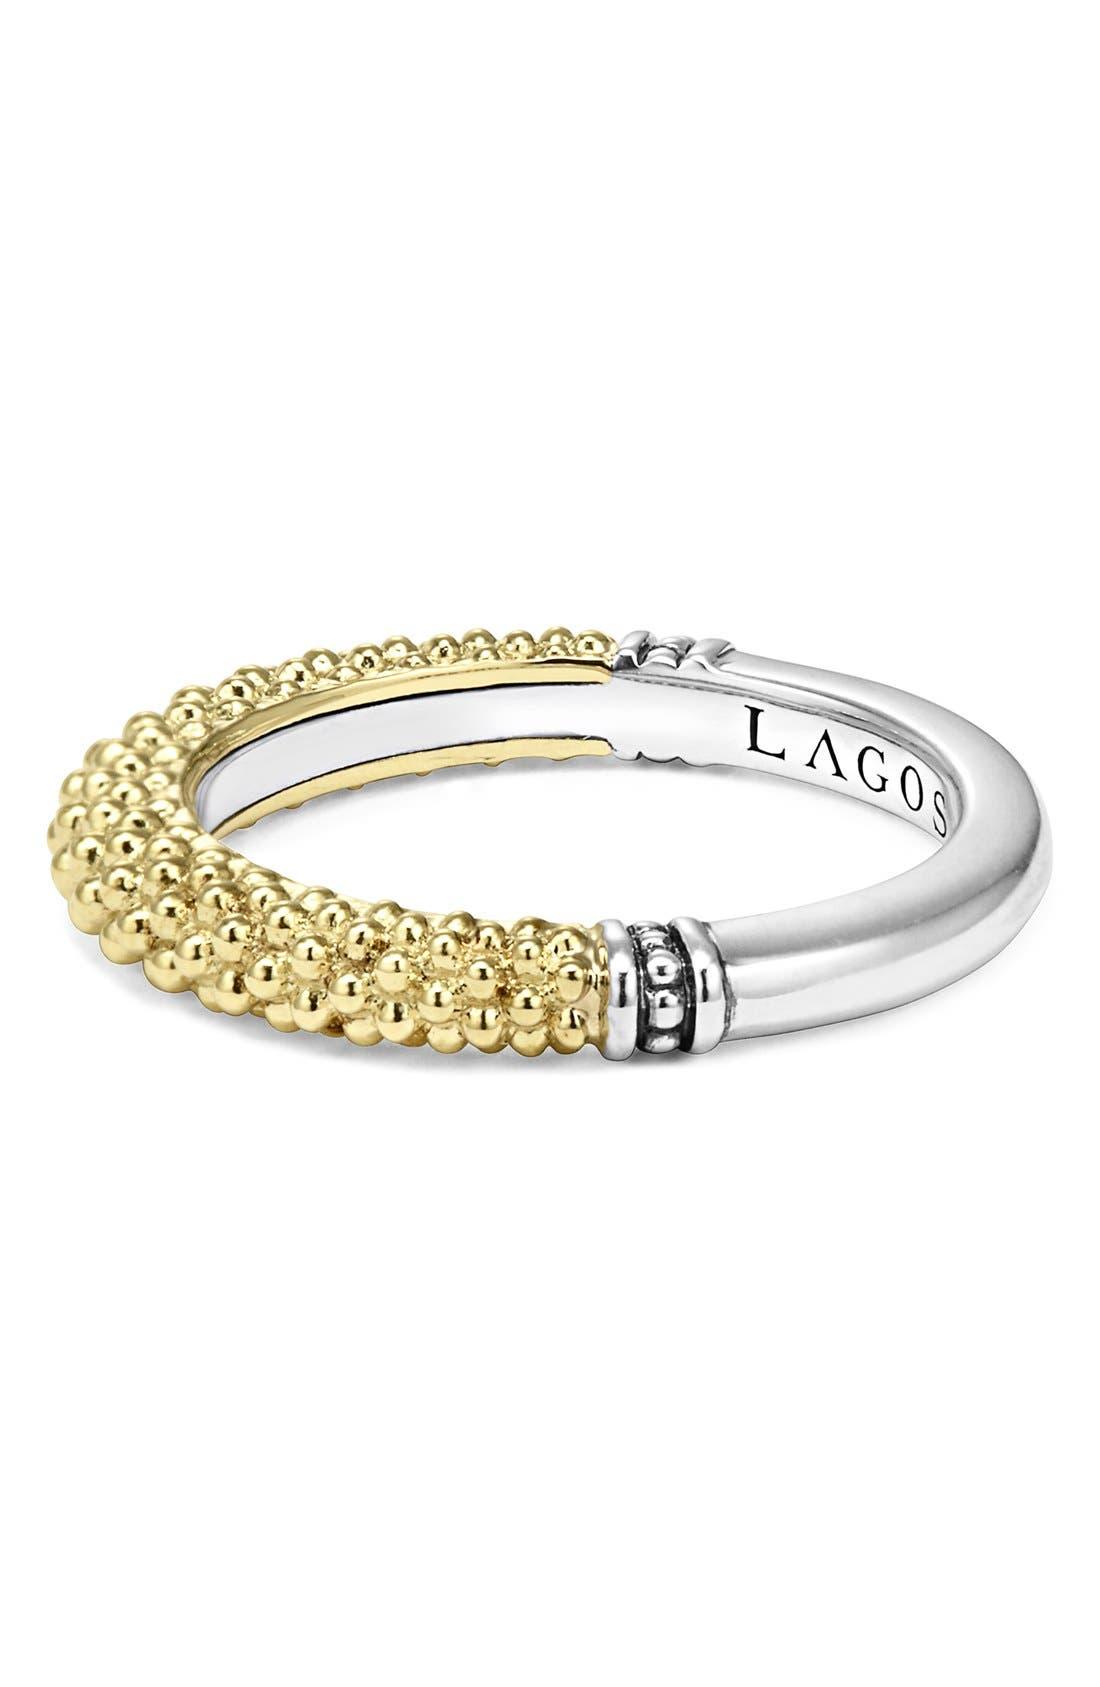 Caviar Stacking Ring,                             Alternate thumbnail 3, color,                             Gold